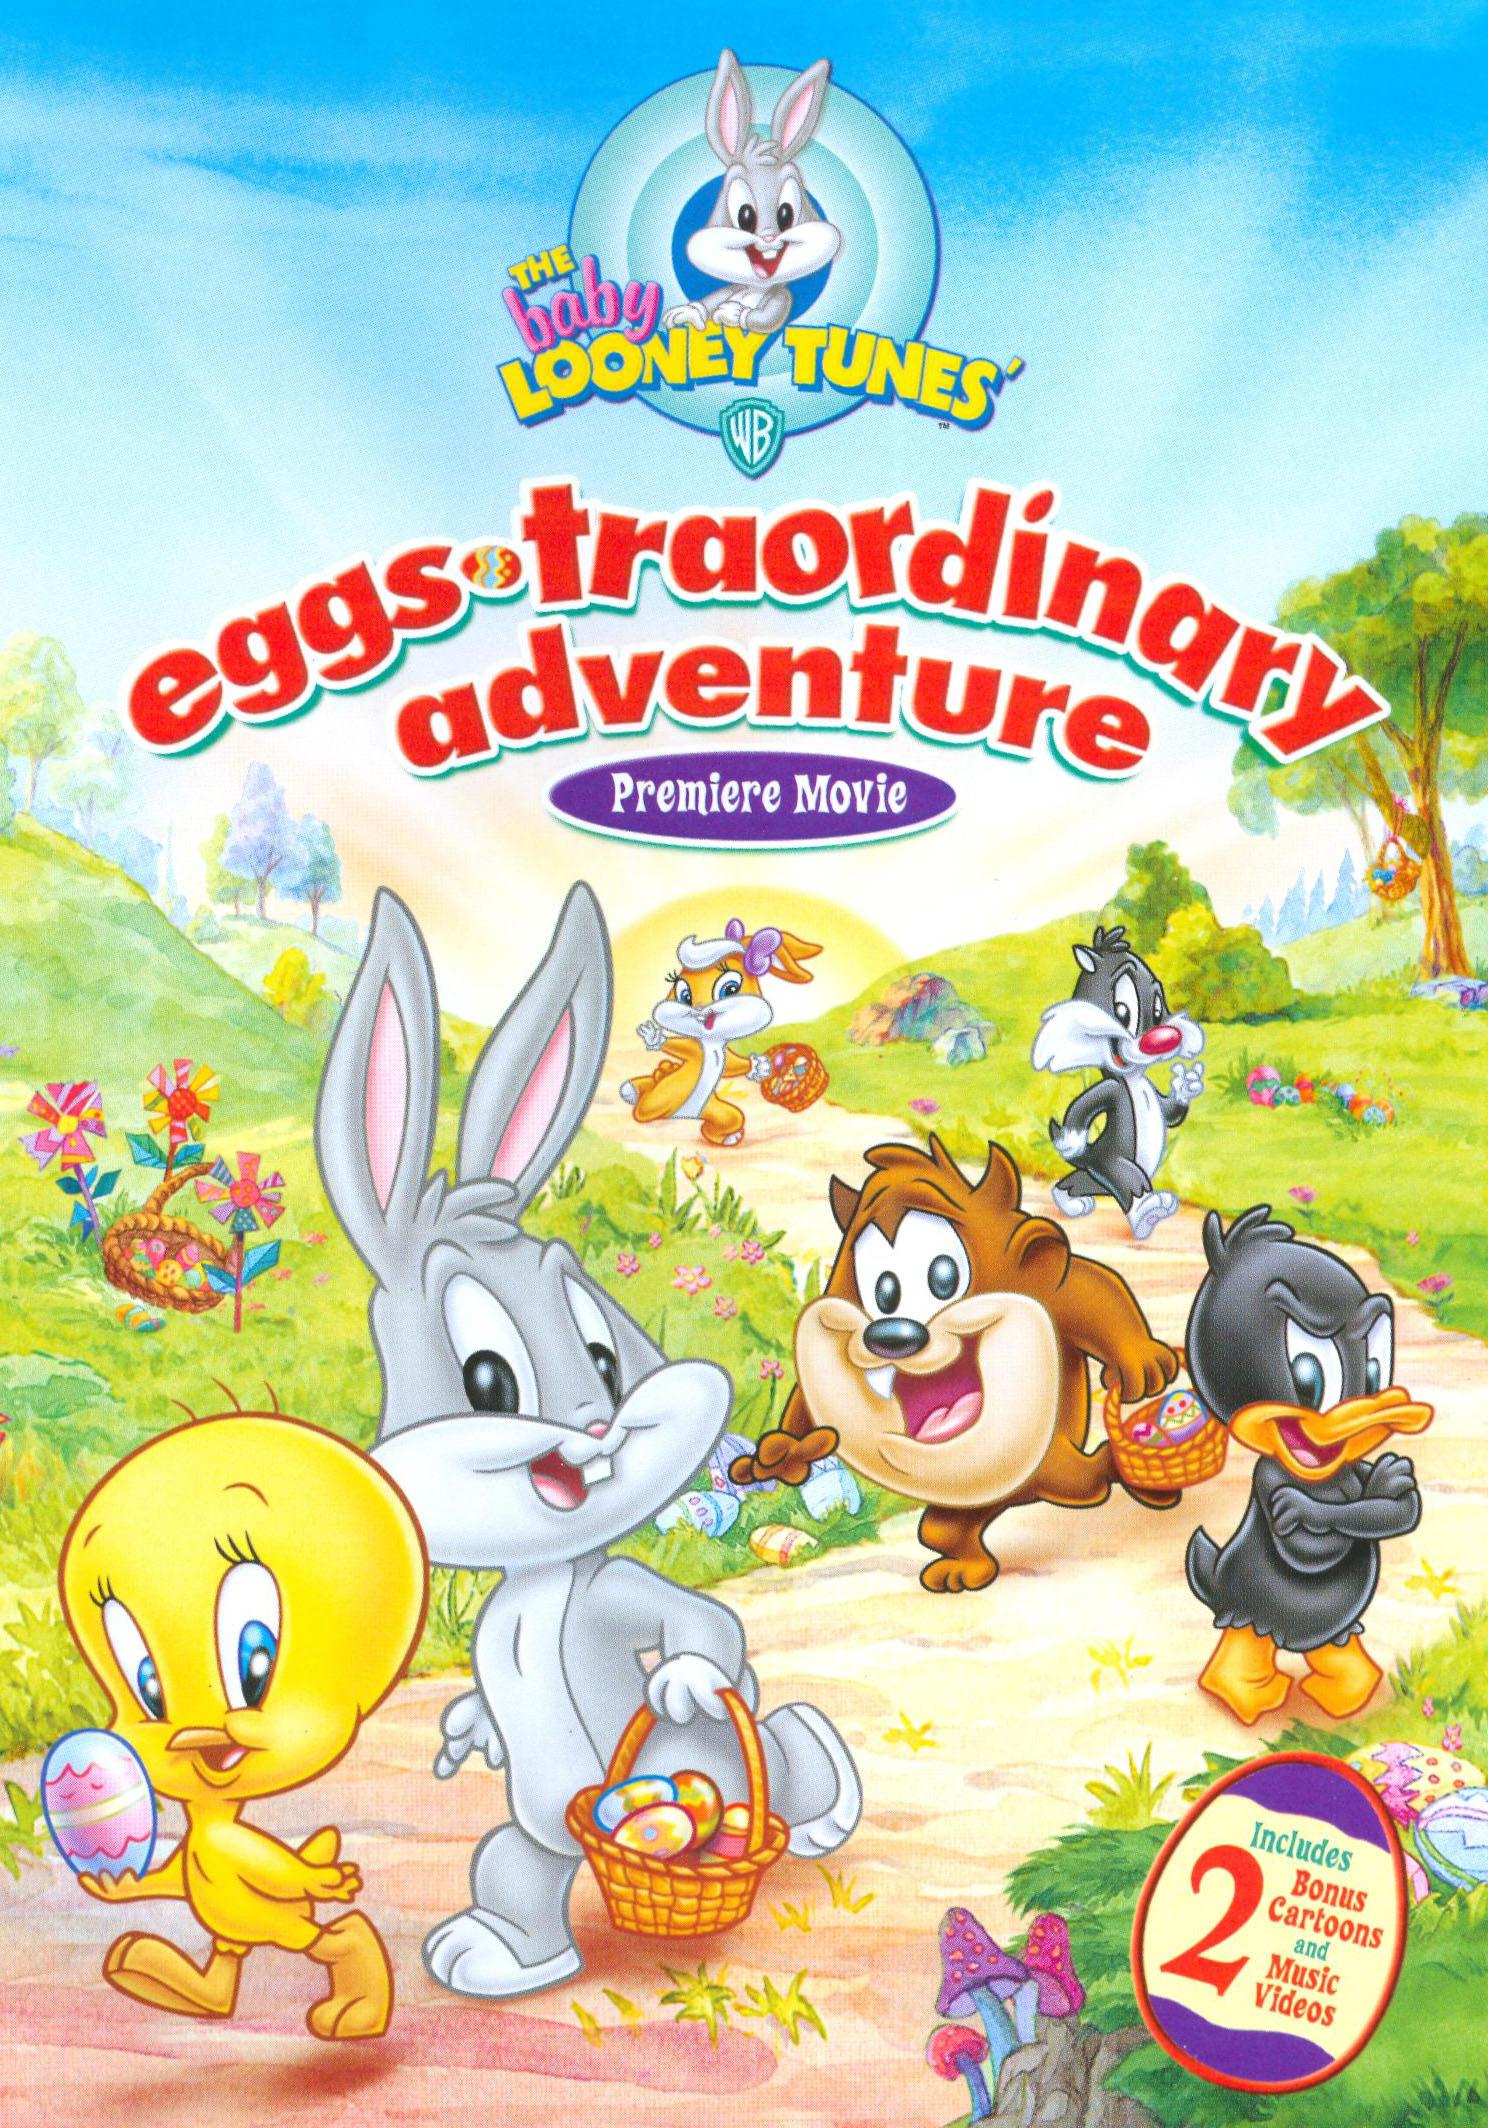 The Baby Looney Tunes' Eggs-Traordinary Adventure